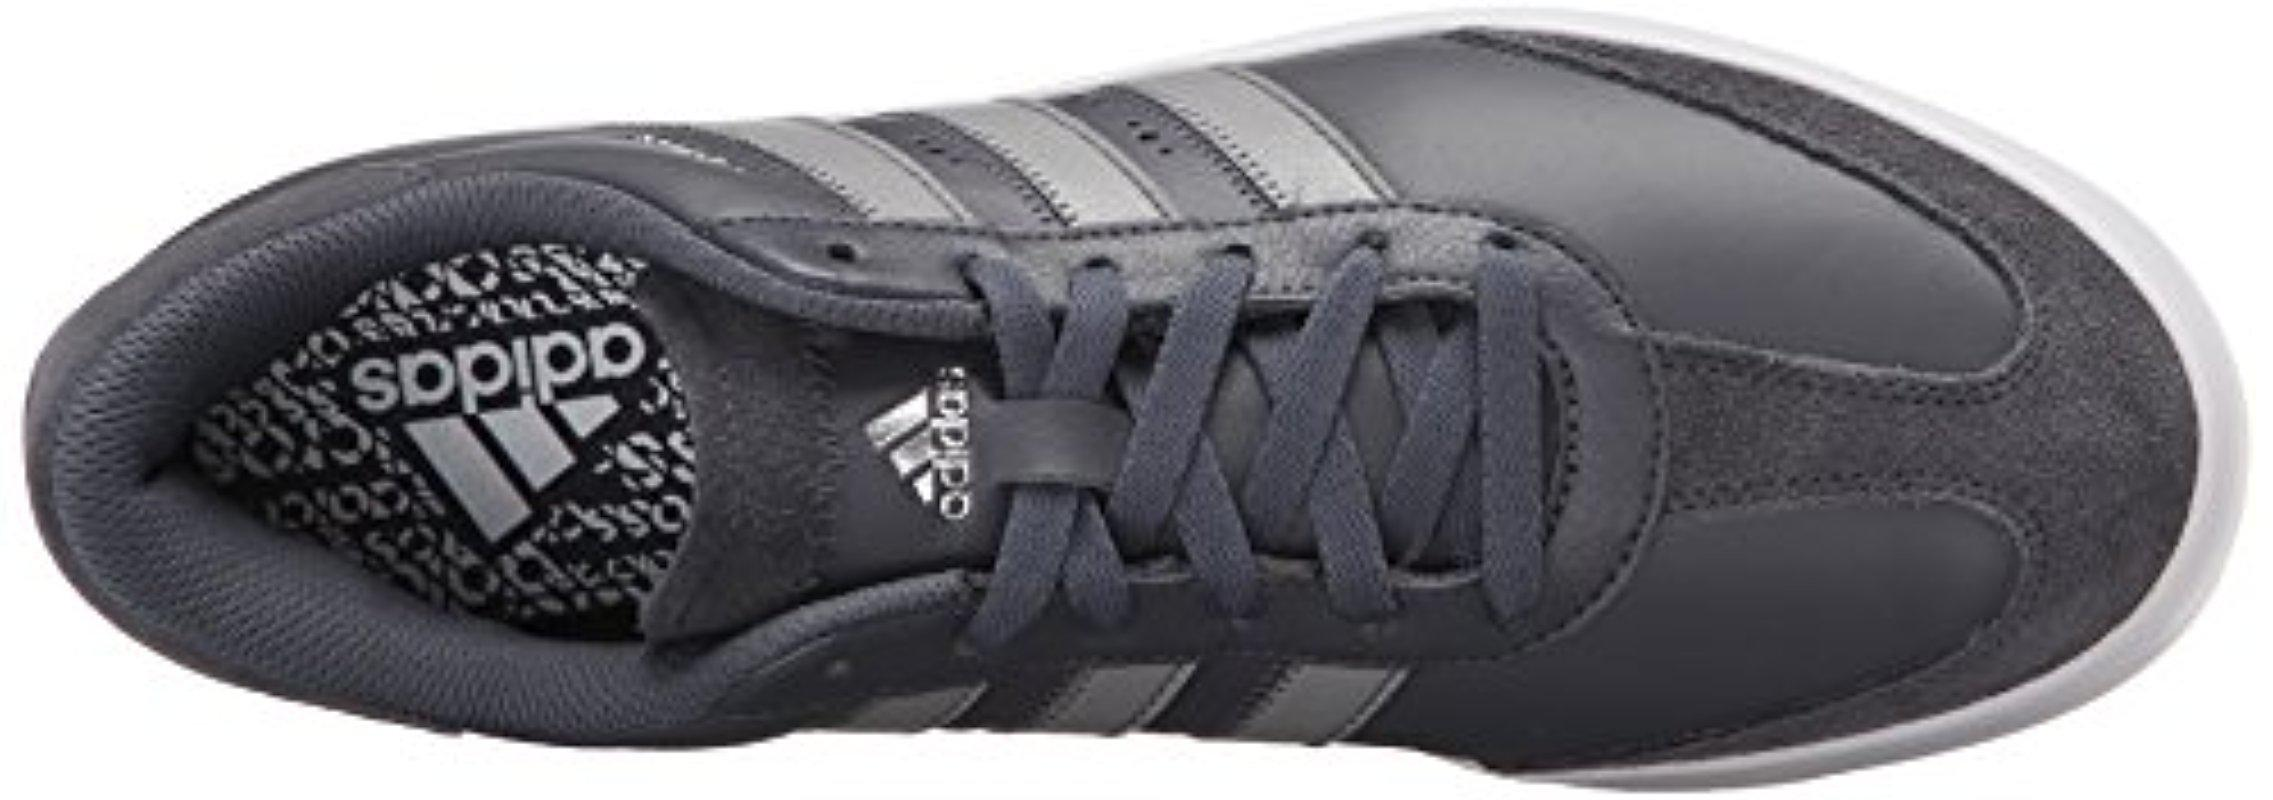 adidas adicross v golf shoes